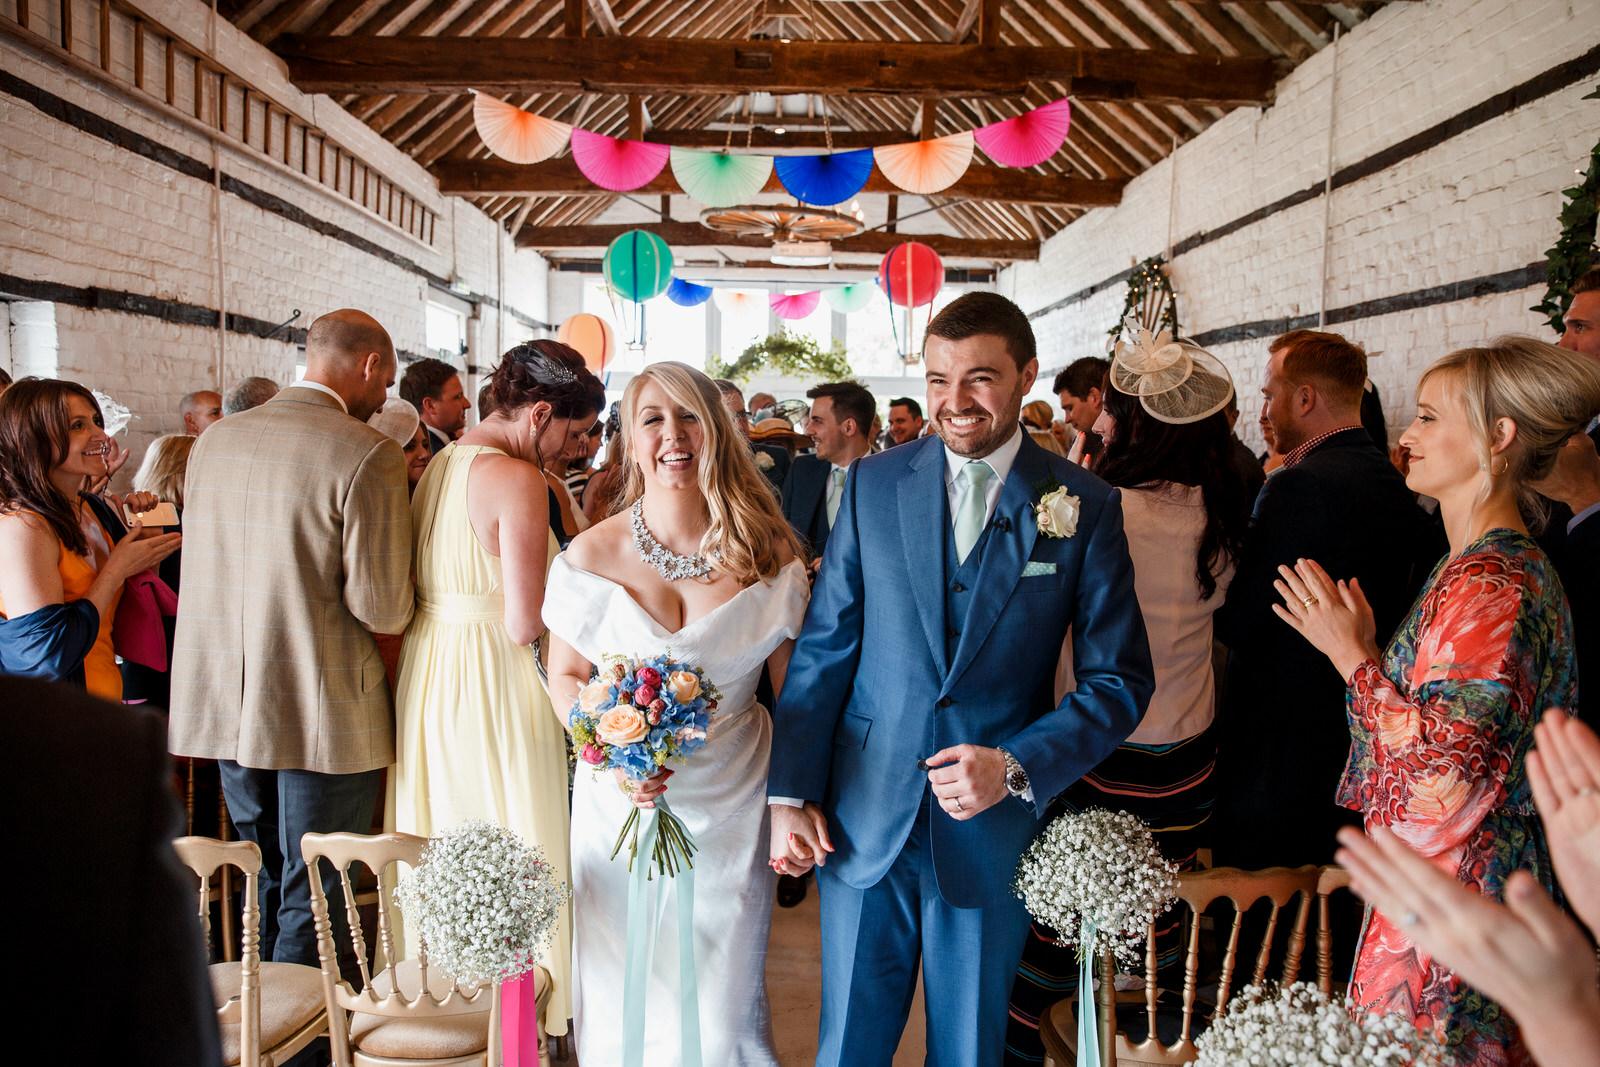 Home counties wedding photography by Damion Mower on English-Wedding.com (17)